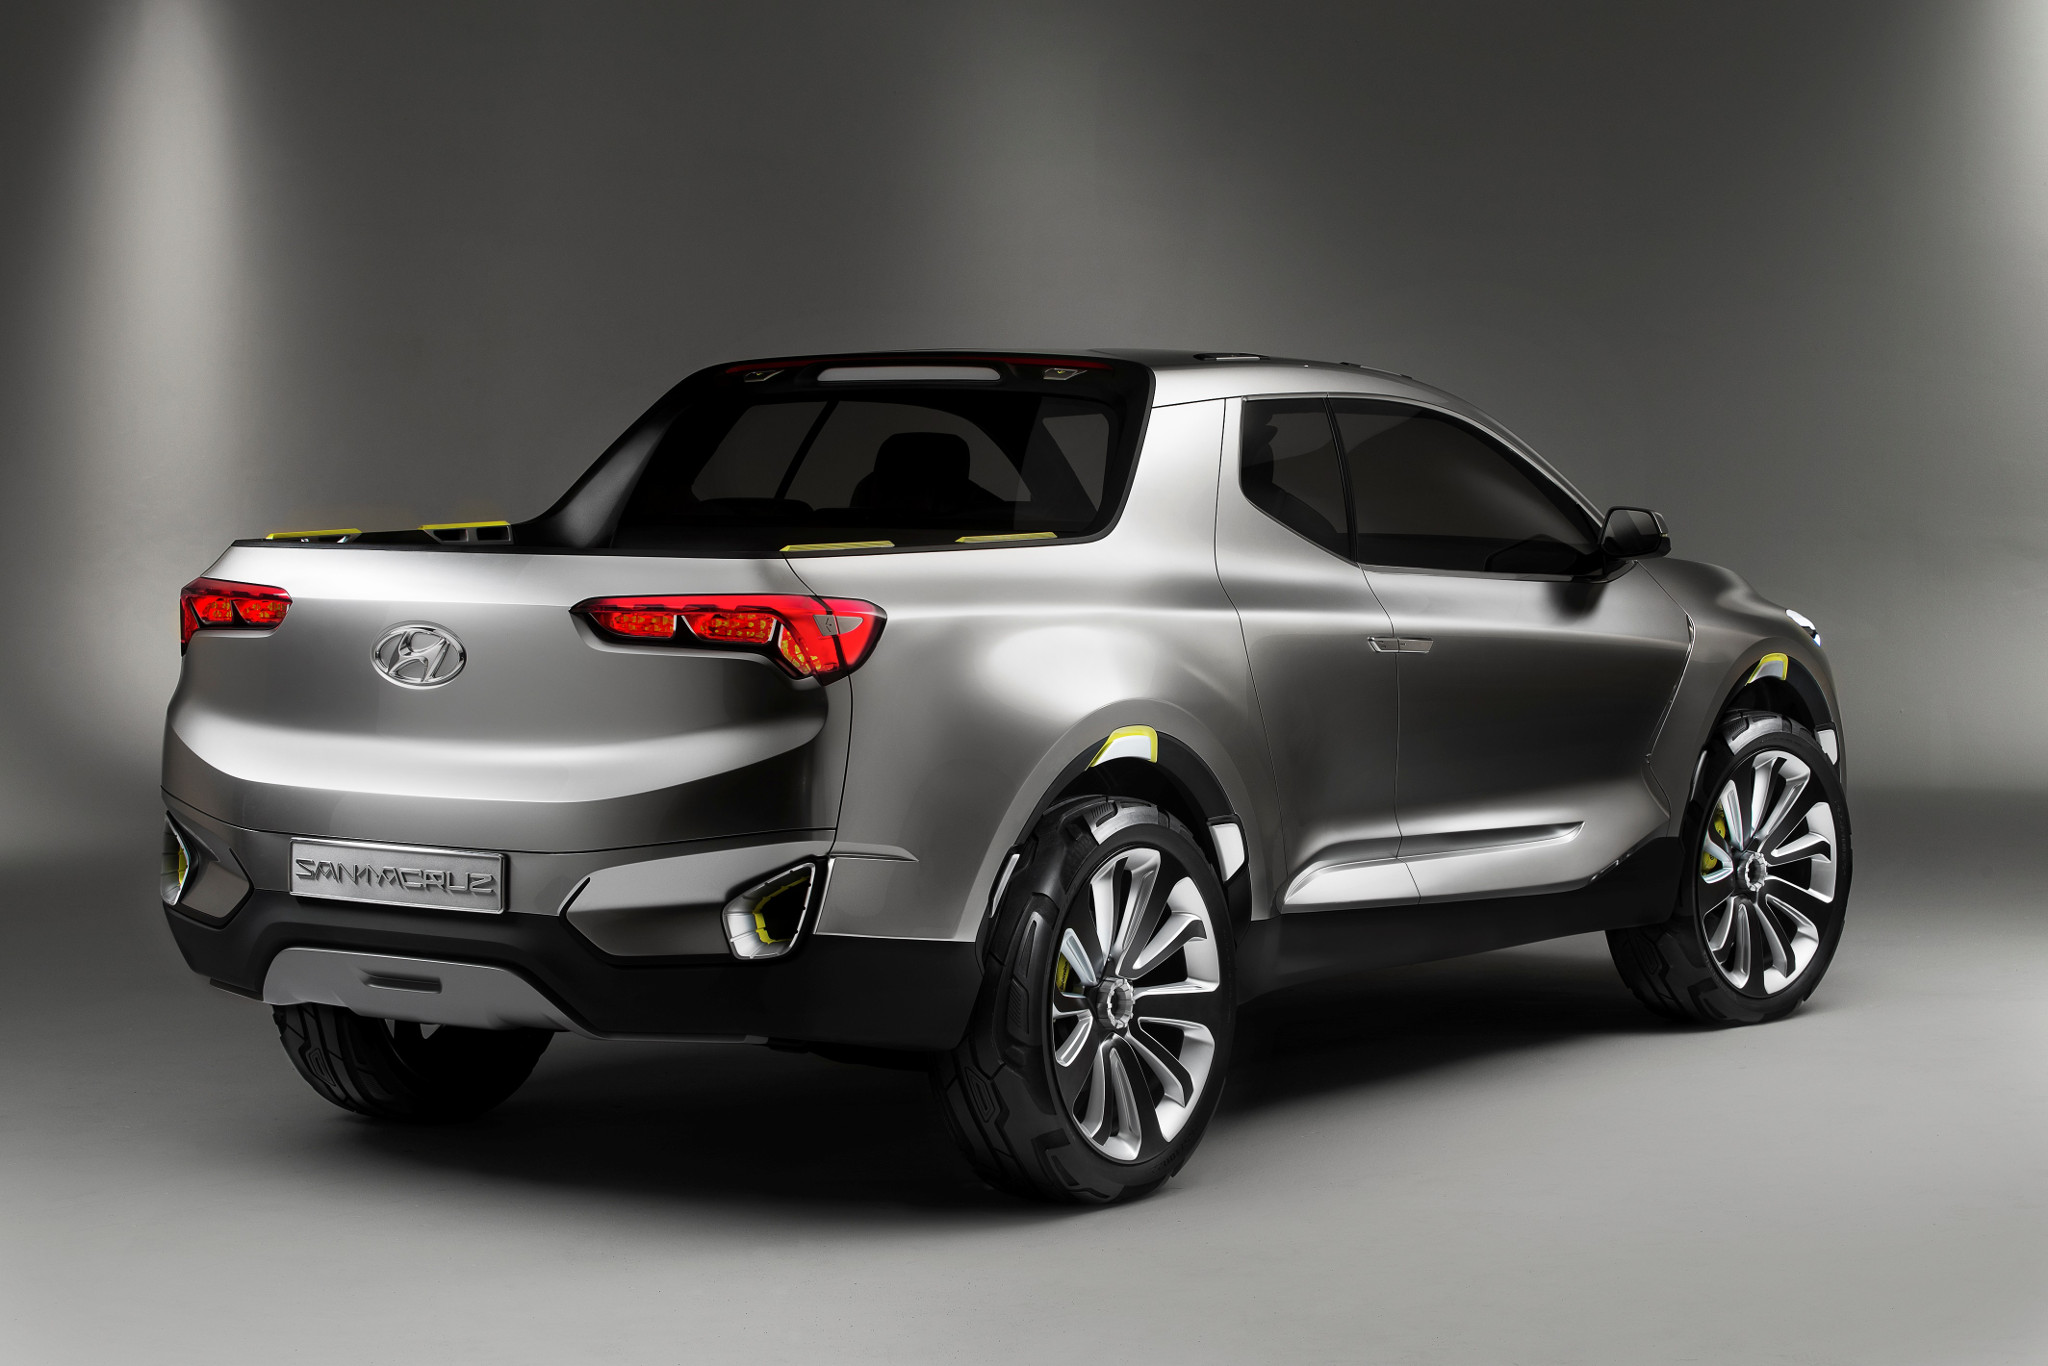 hyundai-santa-cruz-crossover-concept-02-angle--exterior--rear--silver.jpg